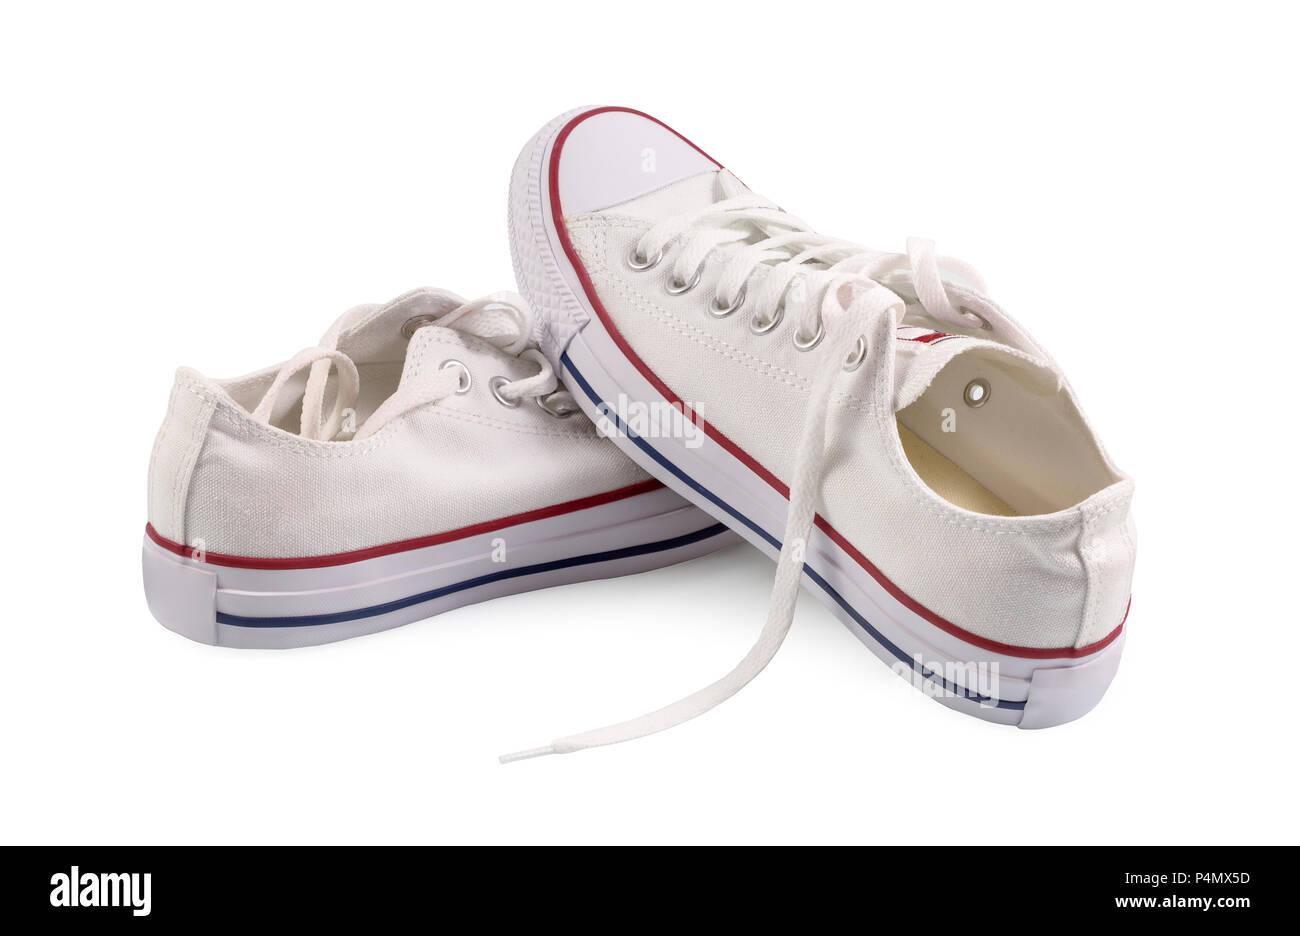 Athletic Shoes Sale Immagini   Athletic Shoes Sale Fotos Stock - Alamy 5c9f86557b6